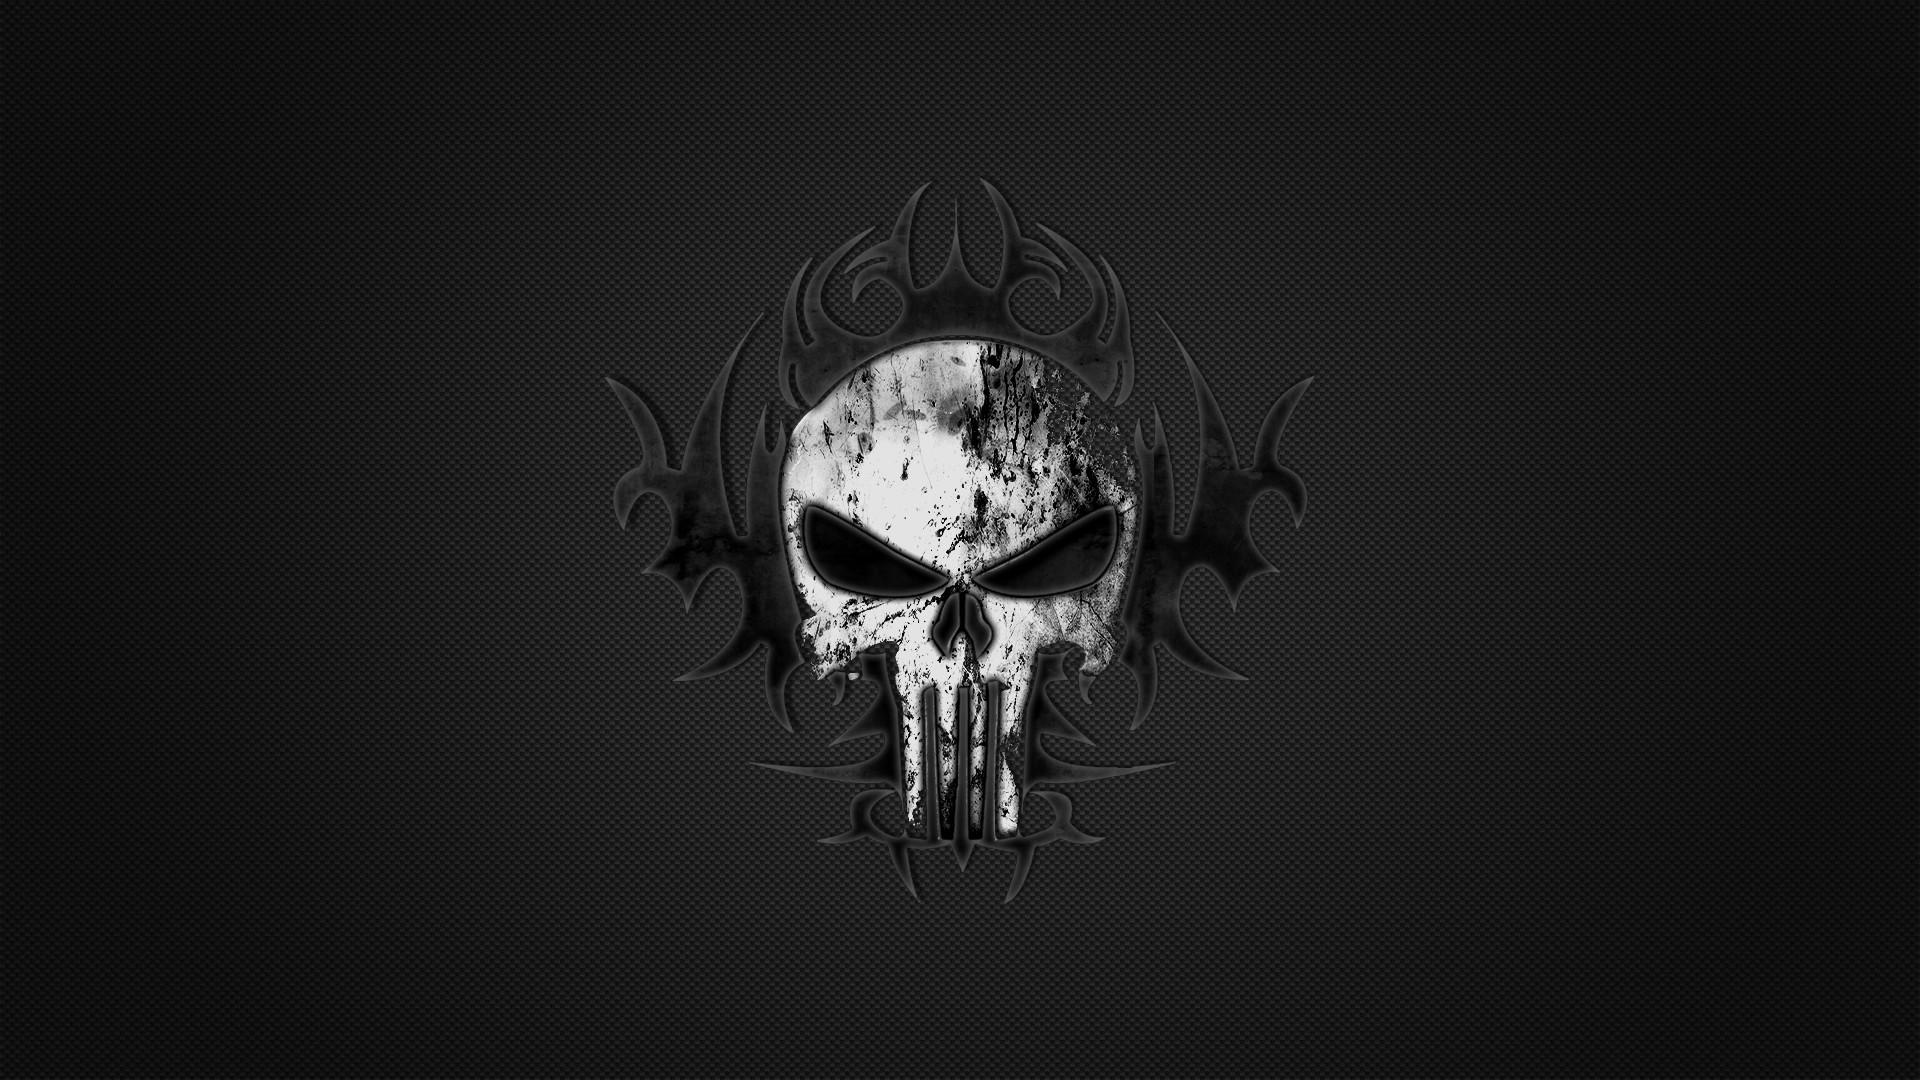 Blue Line Skull Wallpaper – WallpaperSafari